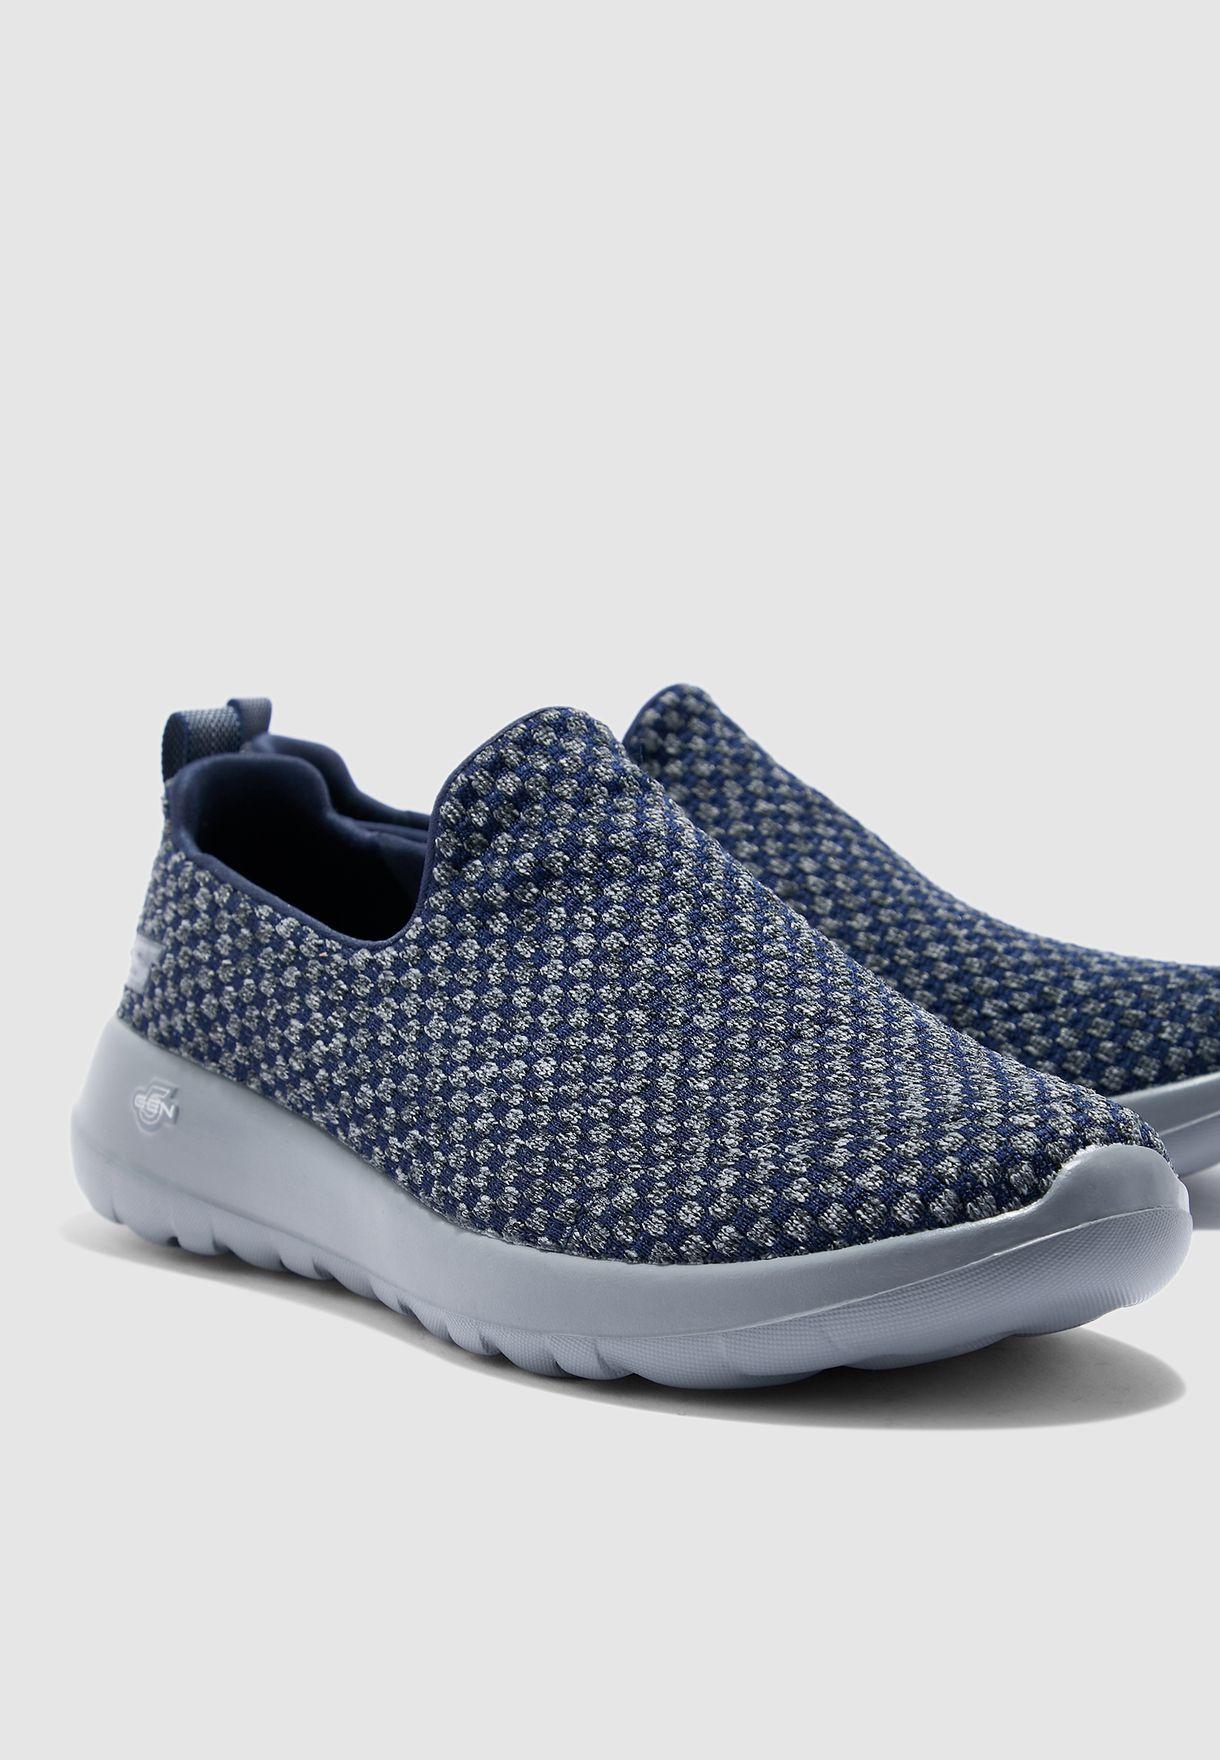 Skechers Go Walk Max Shoes for Men, Blue (Navy), (42 EU AE